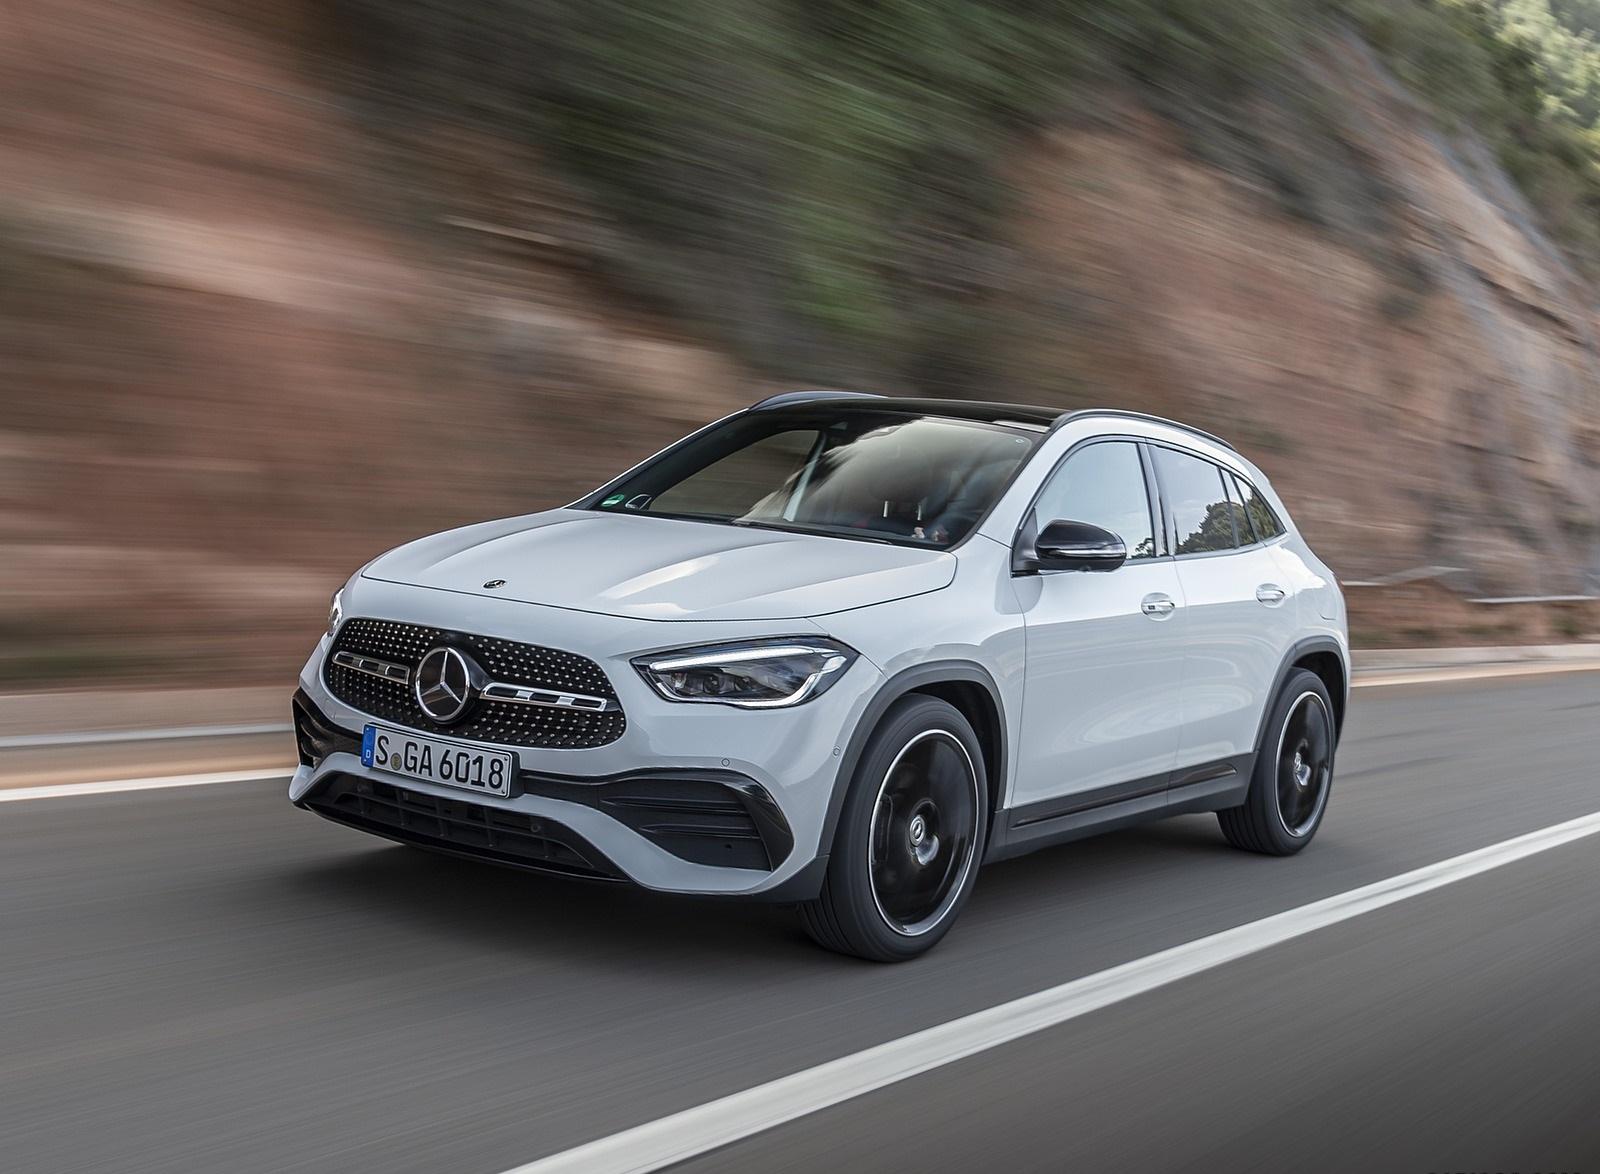 2021 Mercedes-Benz GLA 250 (Color: Digital White) Front Three-Quarter Wallpapers (2)